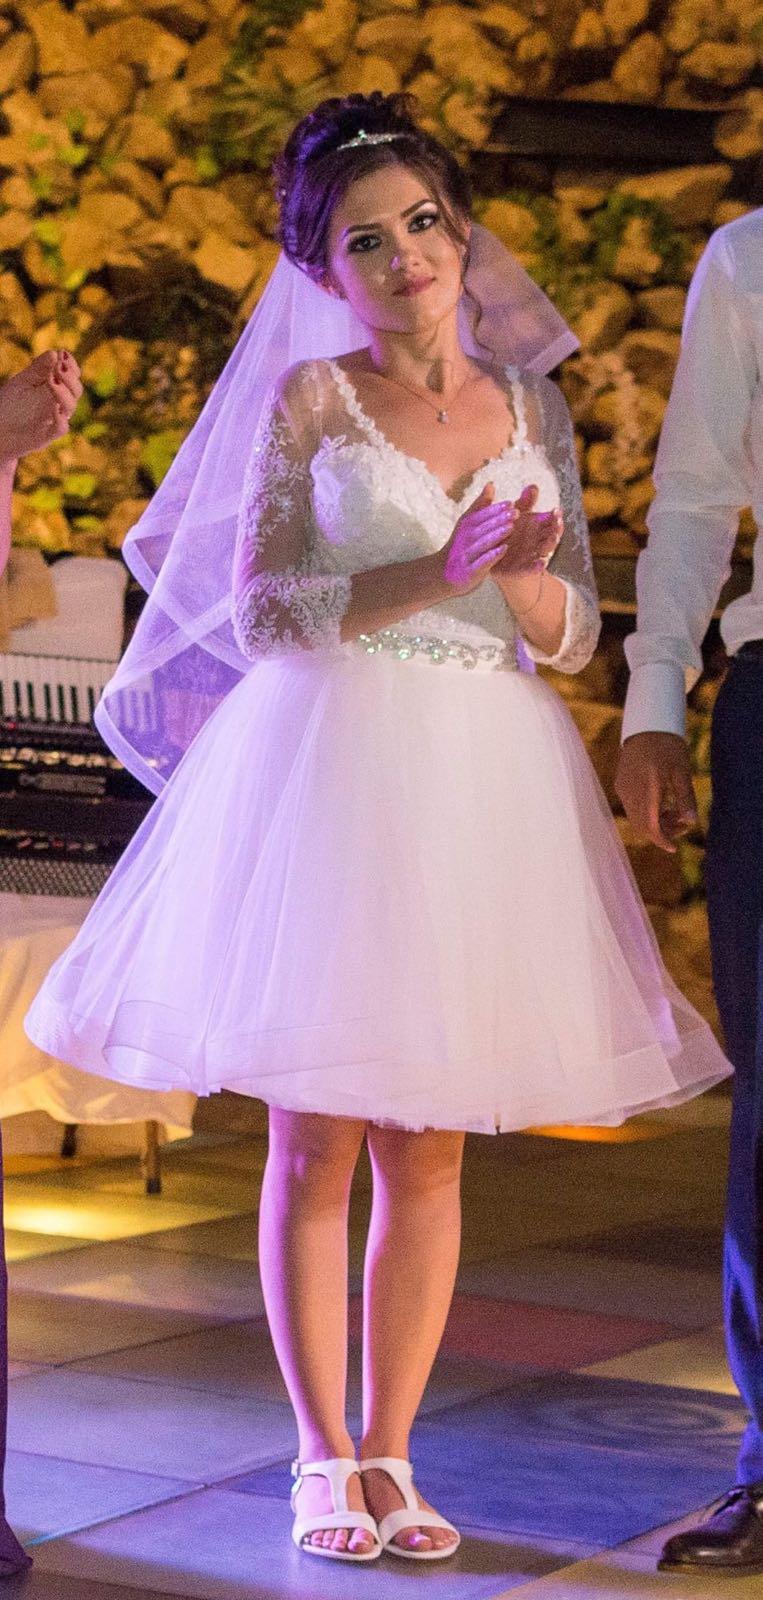 adriana beatrice rochia de mireasa 5 in 1 (2)